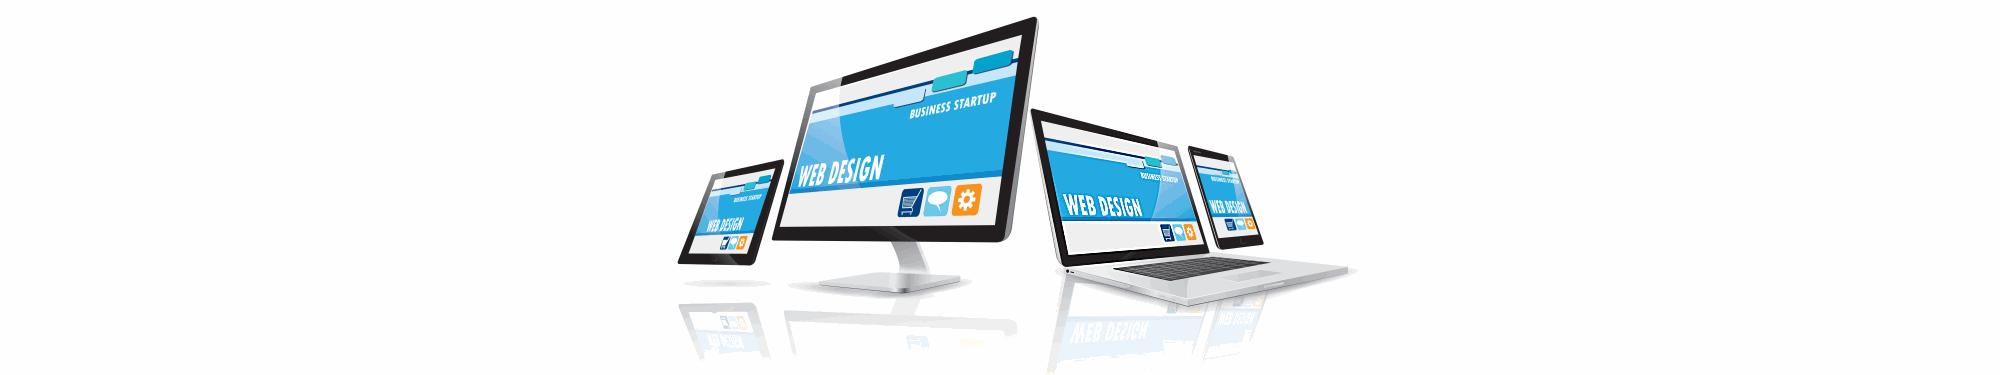 affordable website design for small businesses in York, Lancaster, Harrisburg Pennsylvania